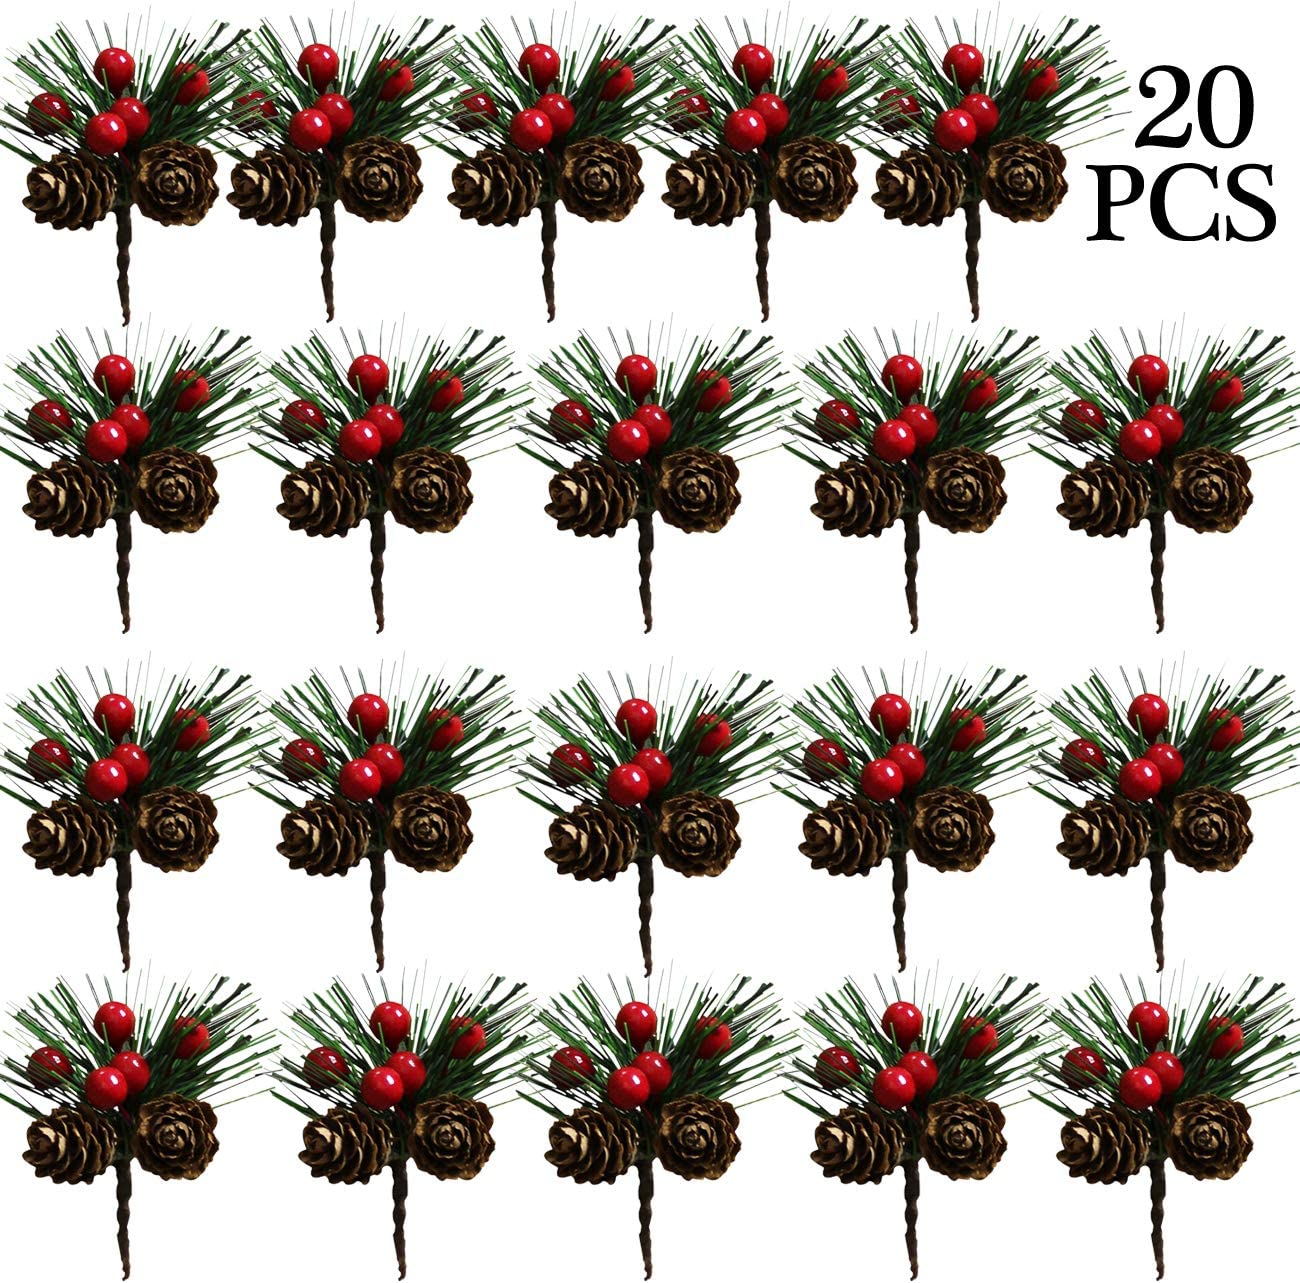 Acronde 20PCS Artificial Pine Picks Christmas Simulation Pine Needle Small Berries Pinecones for Flower Arrangements Wreaths Wedding Garden Xmas Tree Decorations